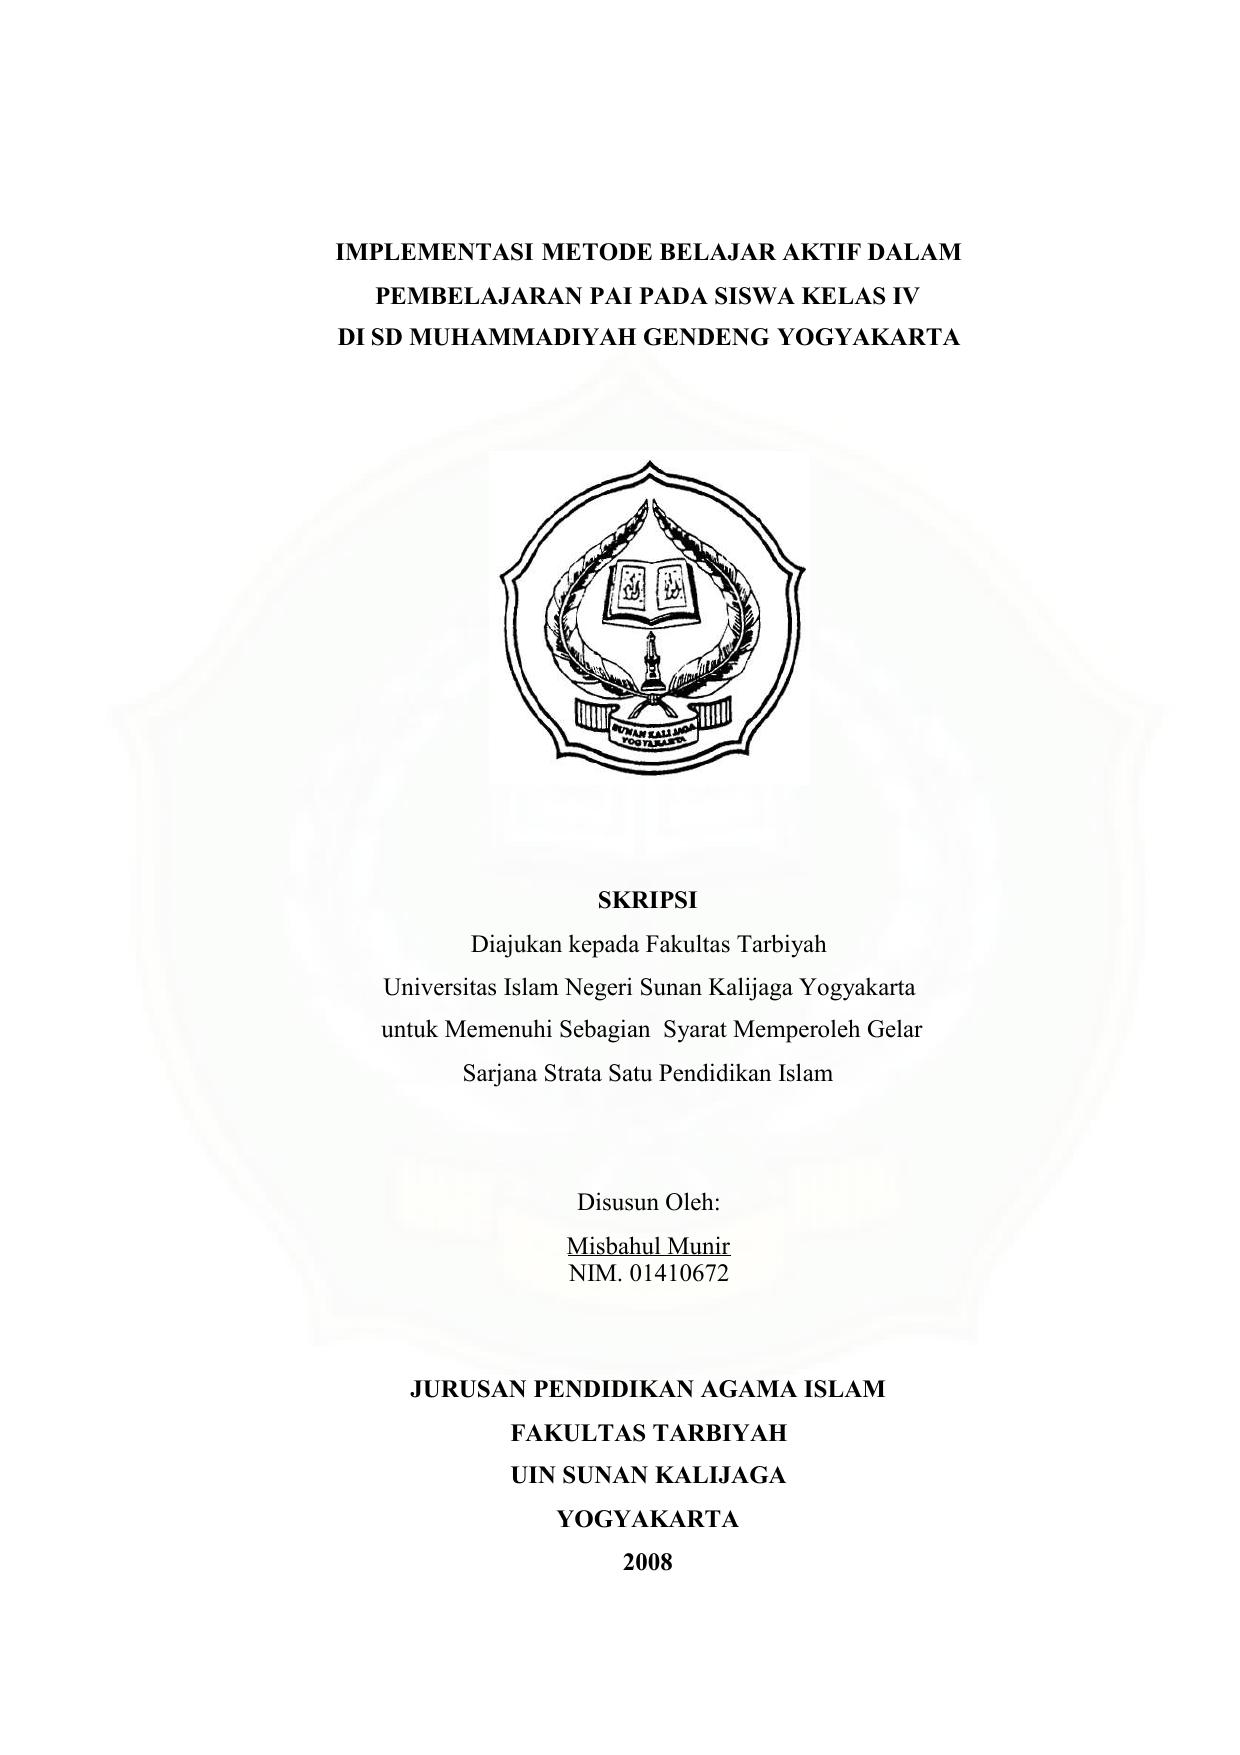 Skripsi Chemist Digital Library Uin Sunan Kalijaga